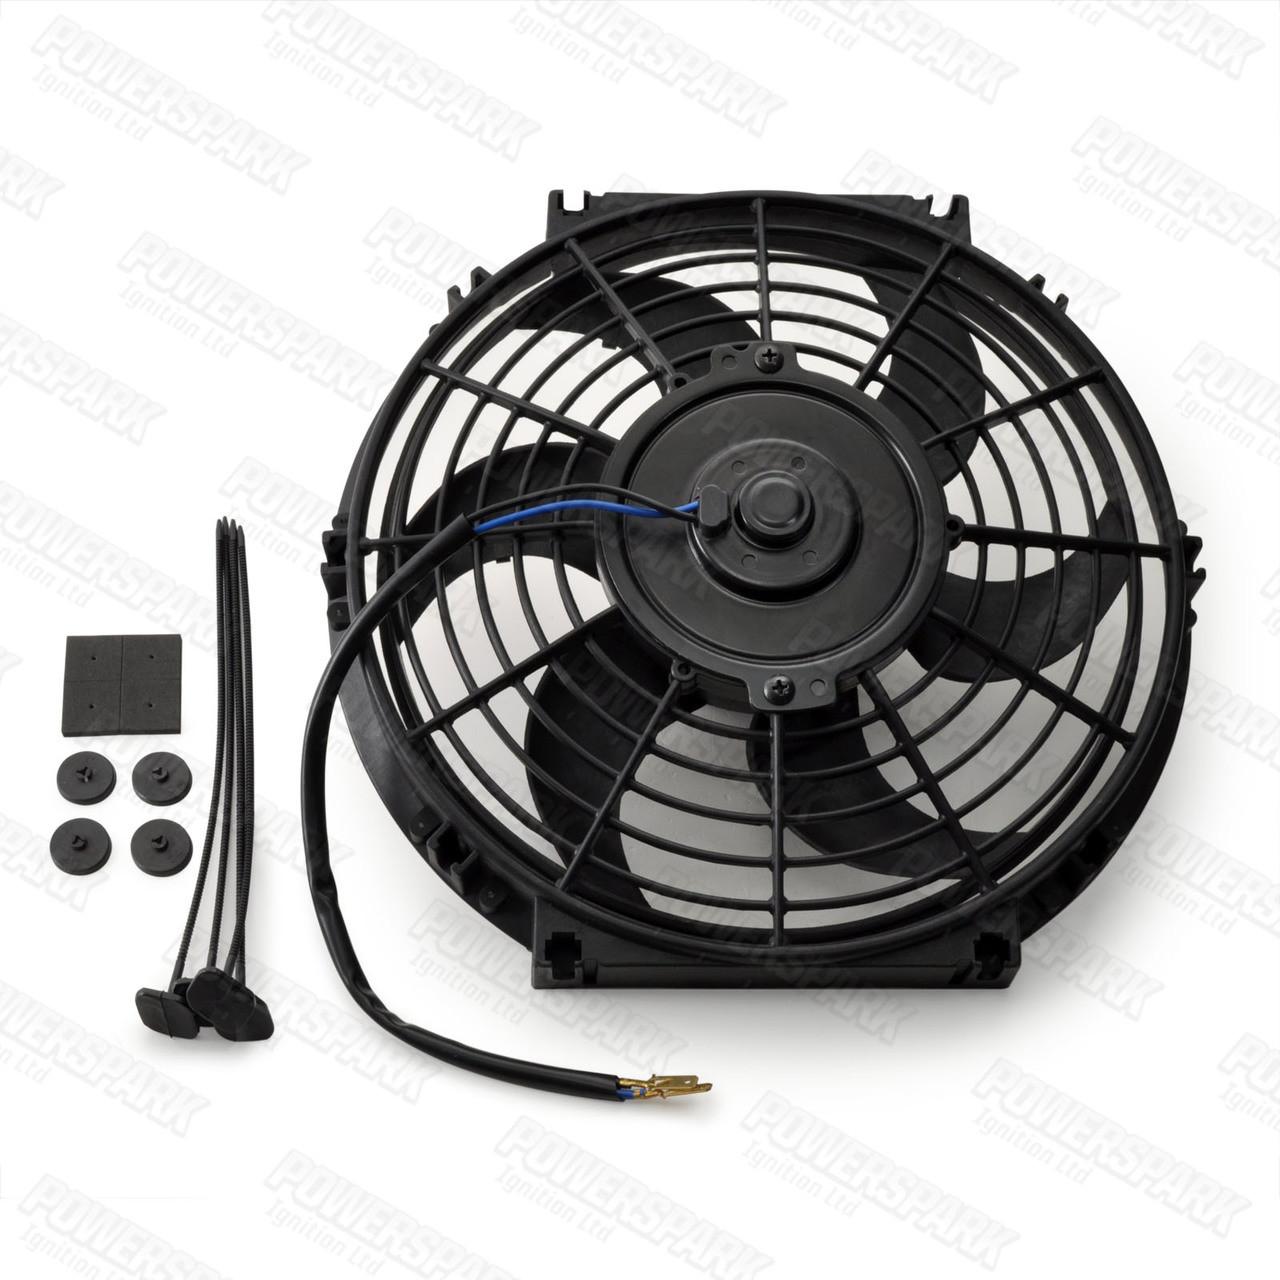 "10"" Powermax Electric Radiator Cooling Fan 120W 12 Volt"